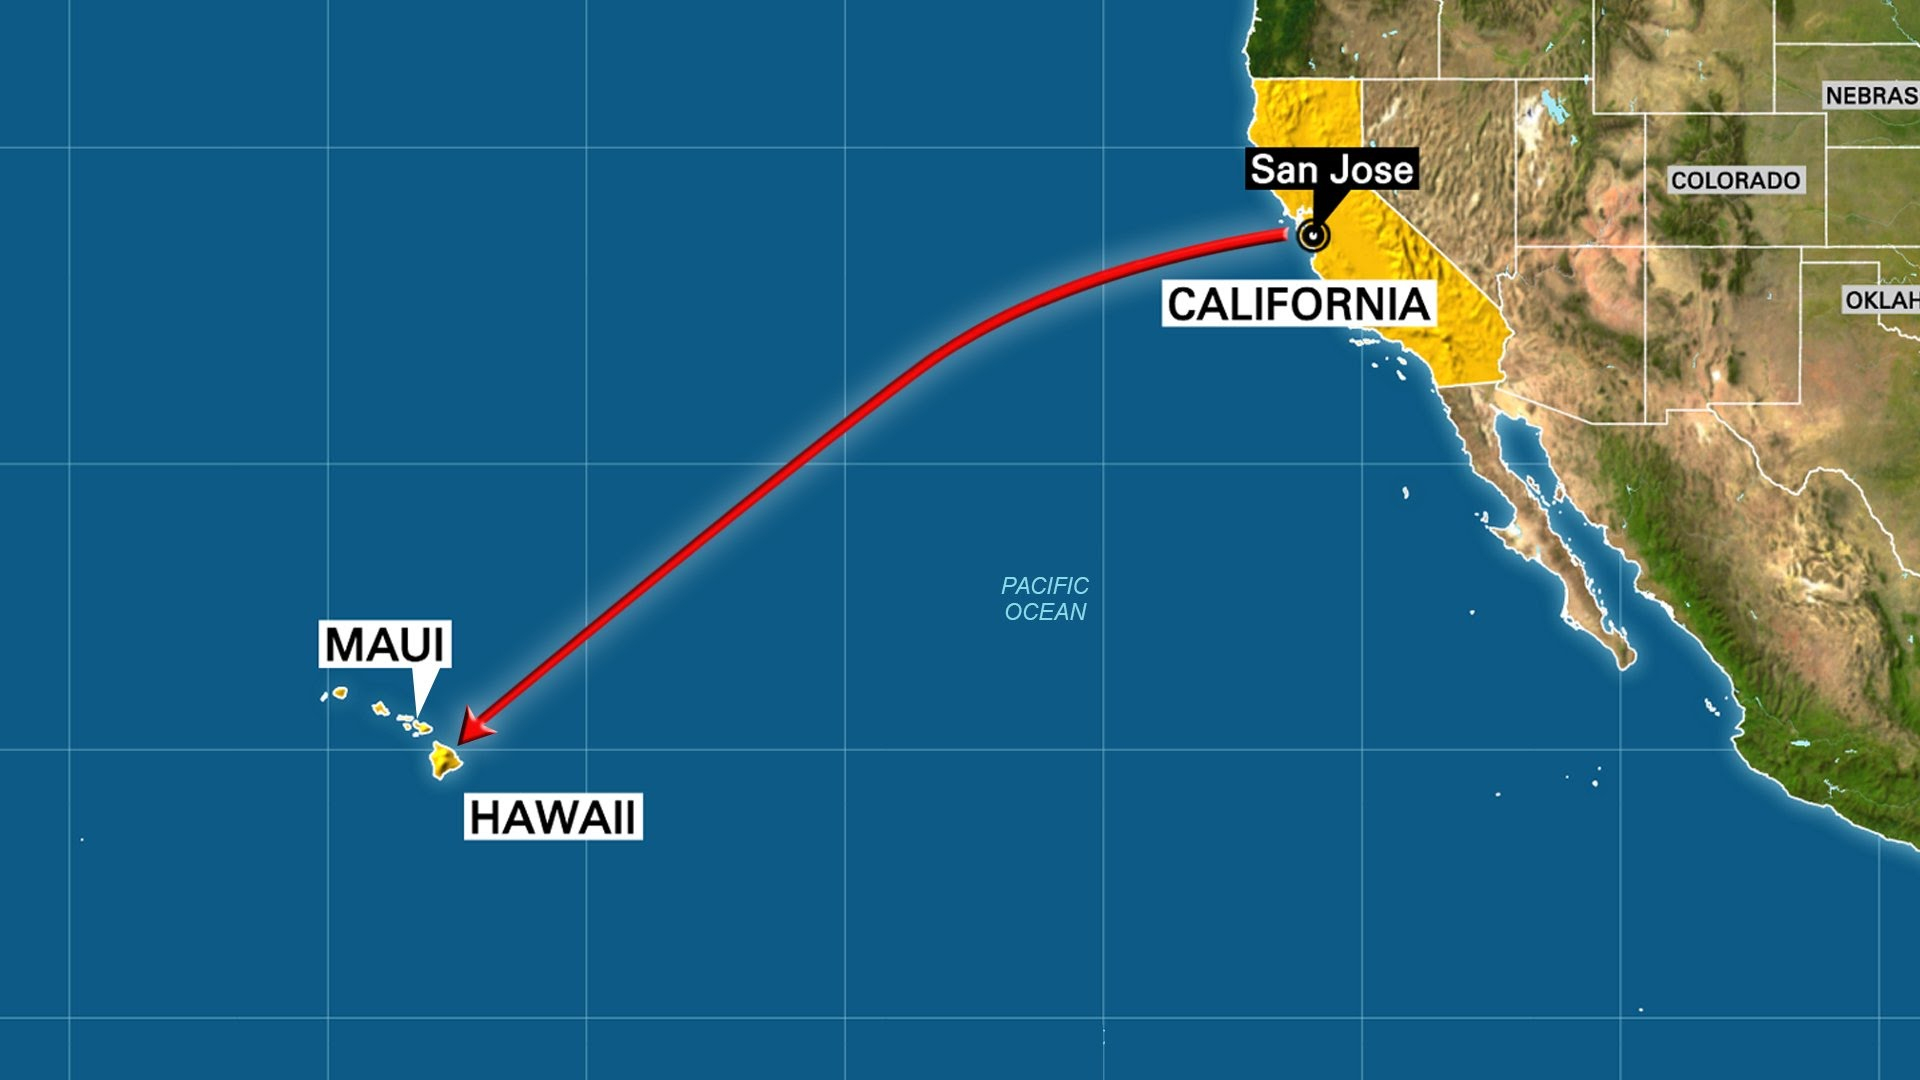 Maxresdefault Map California Map Of California And Hawaii - Klipy - Hawaii California Map